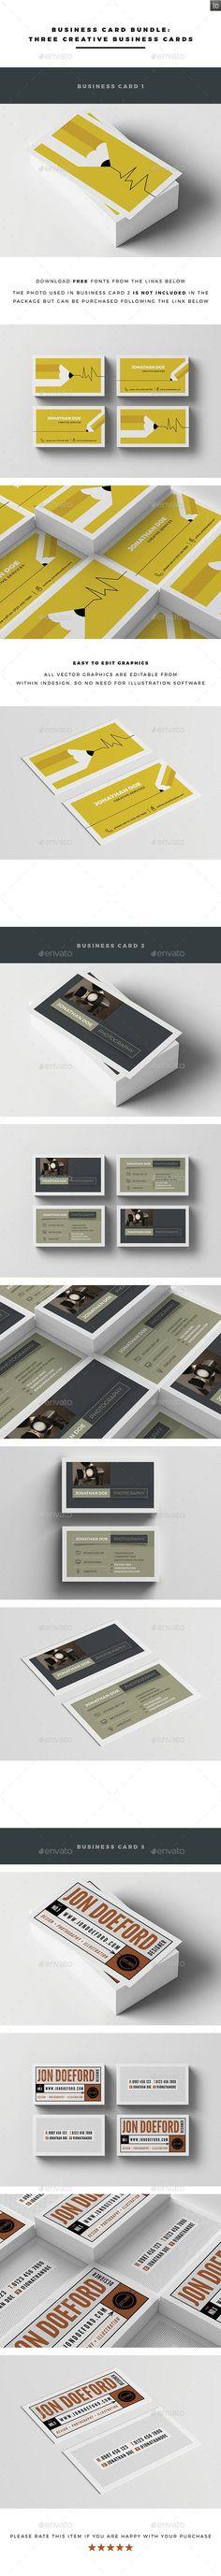 Business Card Bundle Template #design Download: http://graphicriver.net/item/business-card-bundle/12612776?ref=ksioks